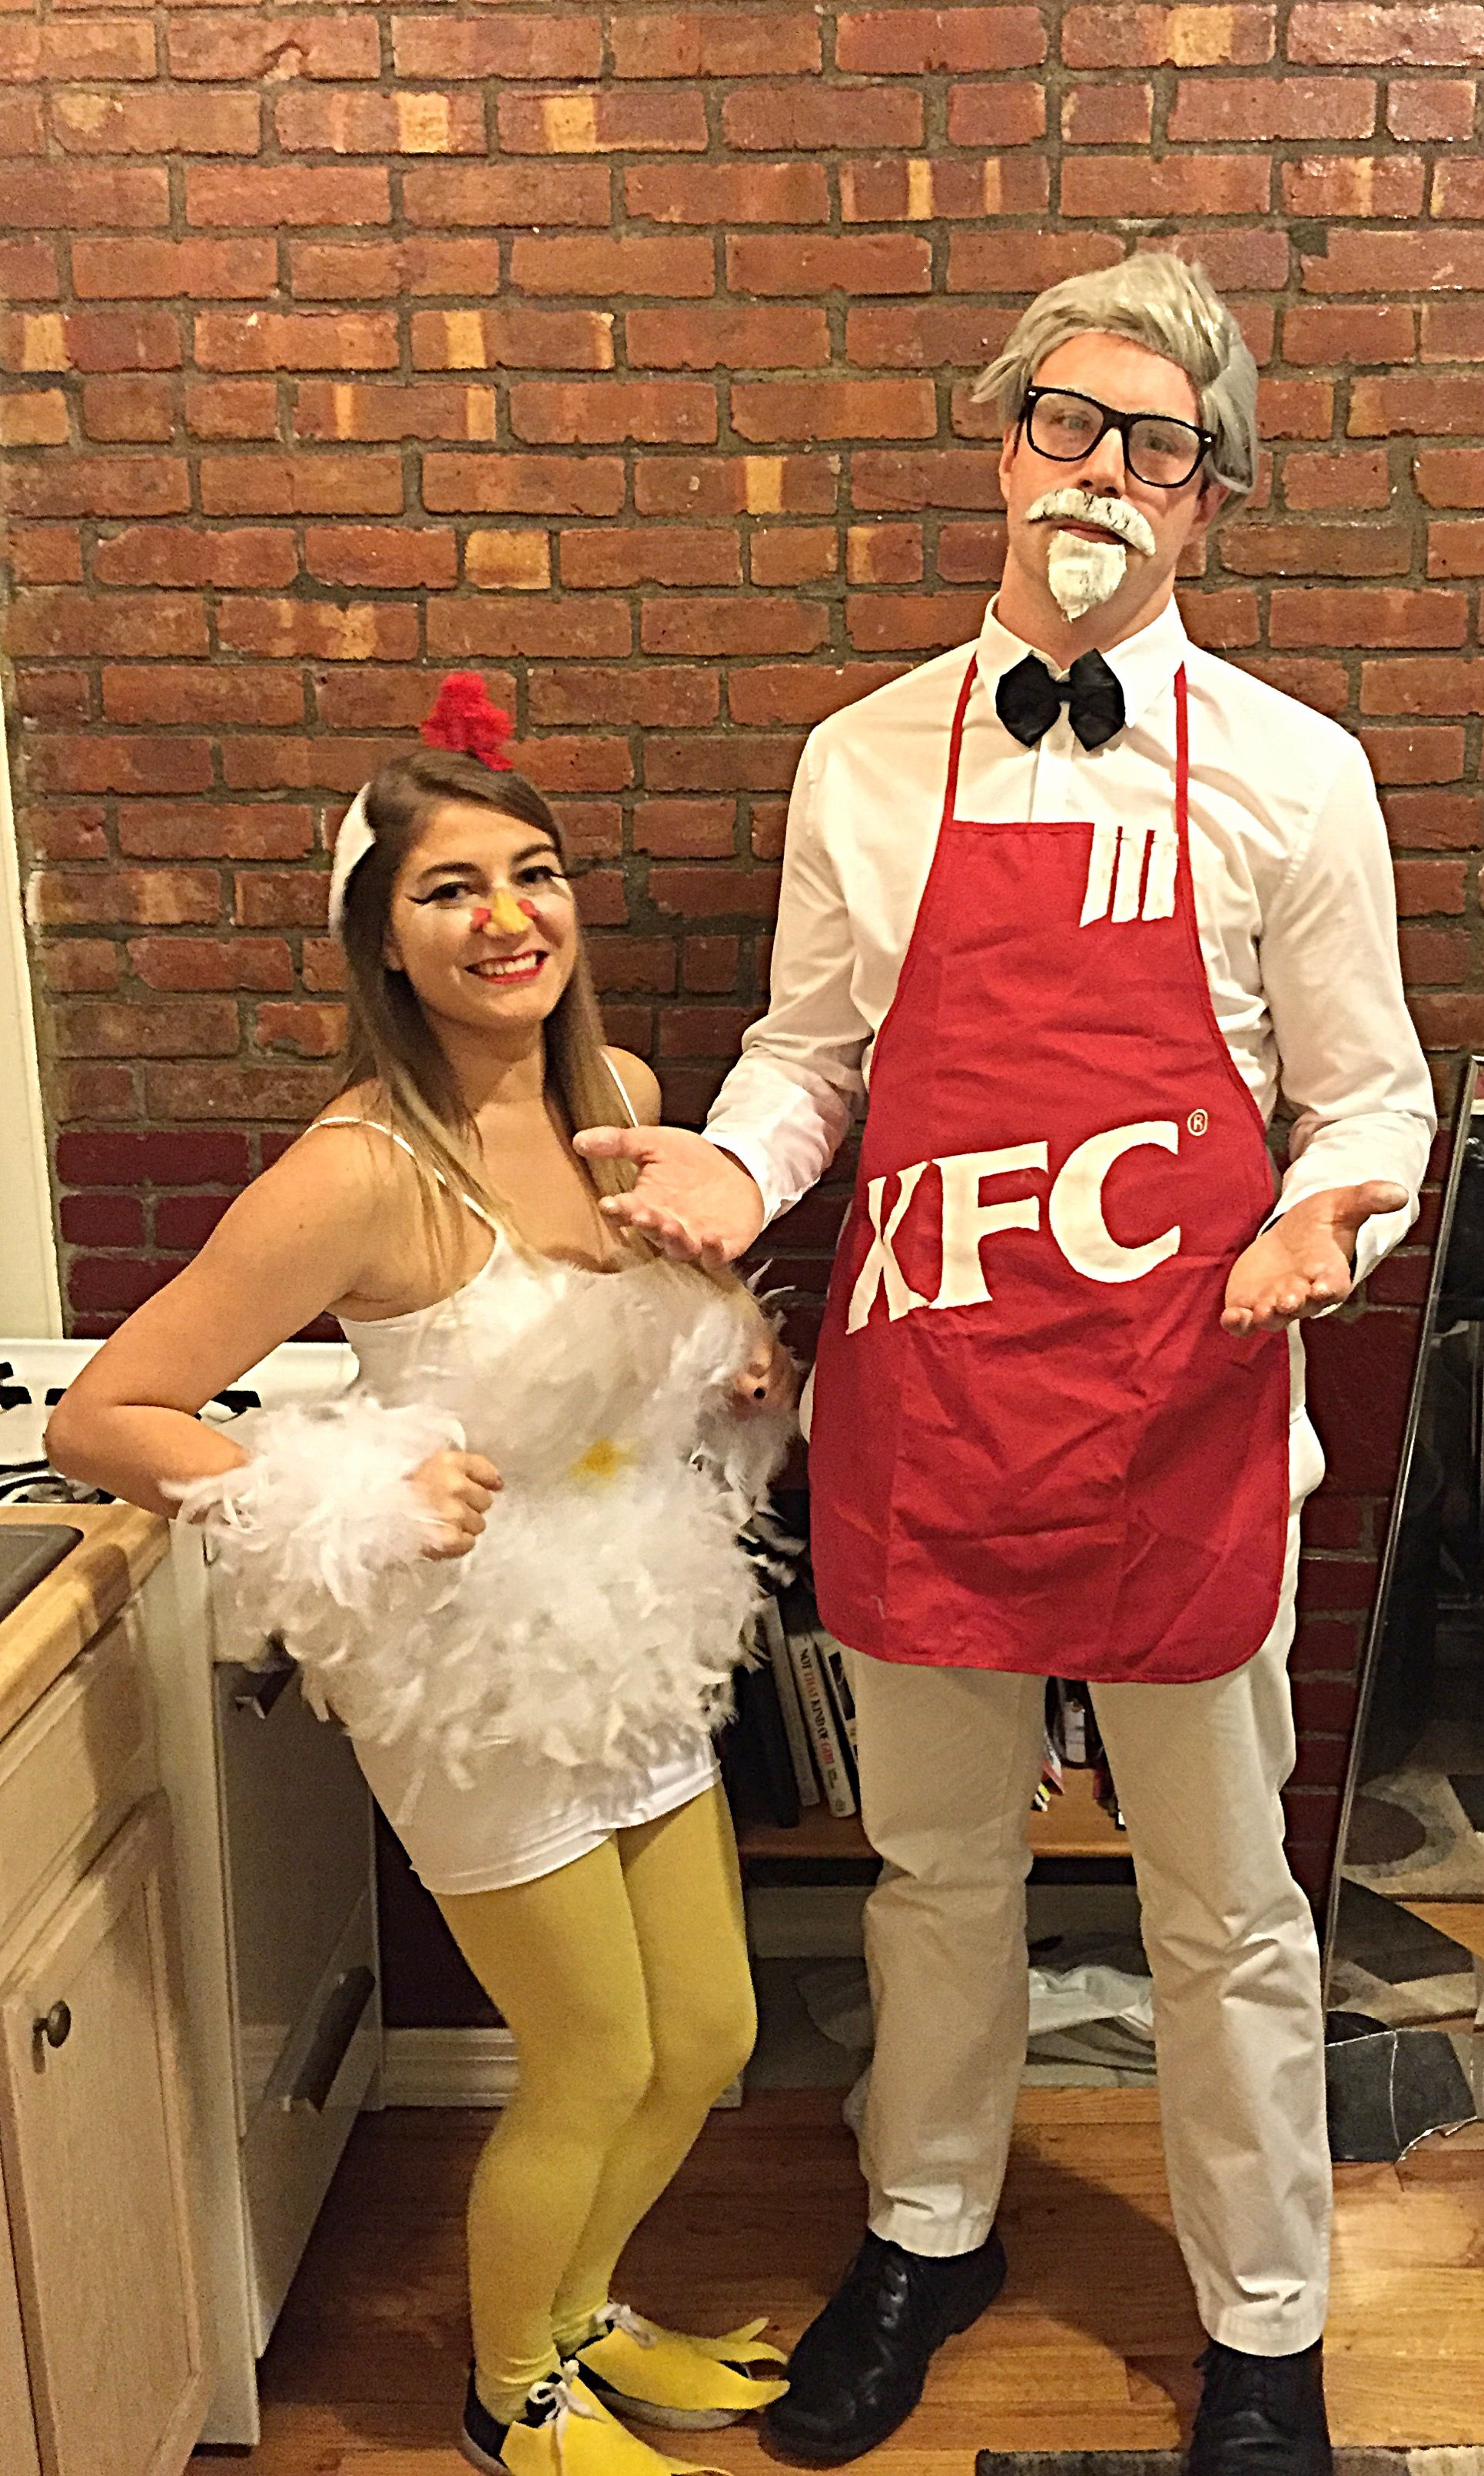 My Home Made Chicken Halloween Costume And Homemade Kfc